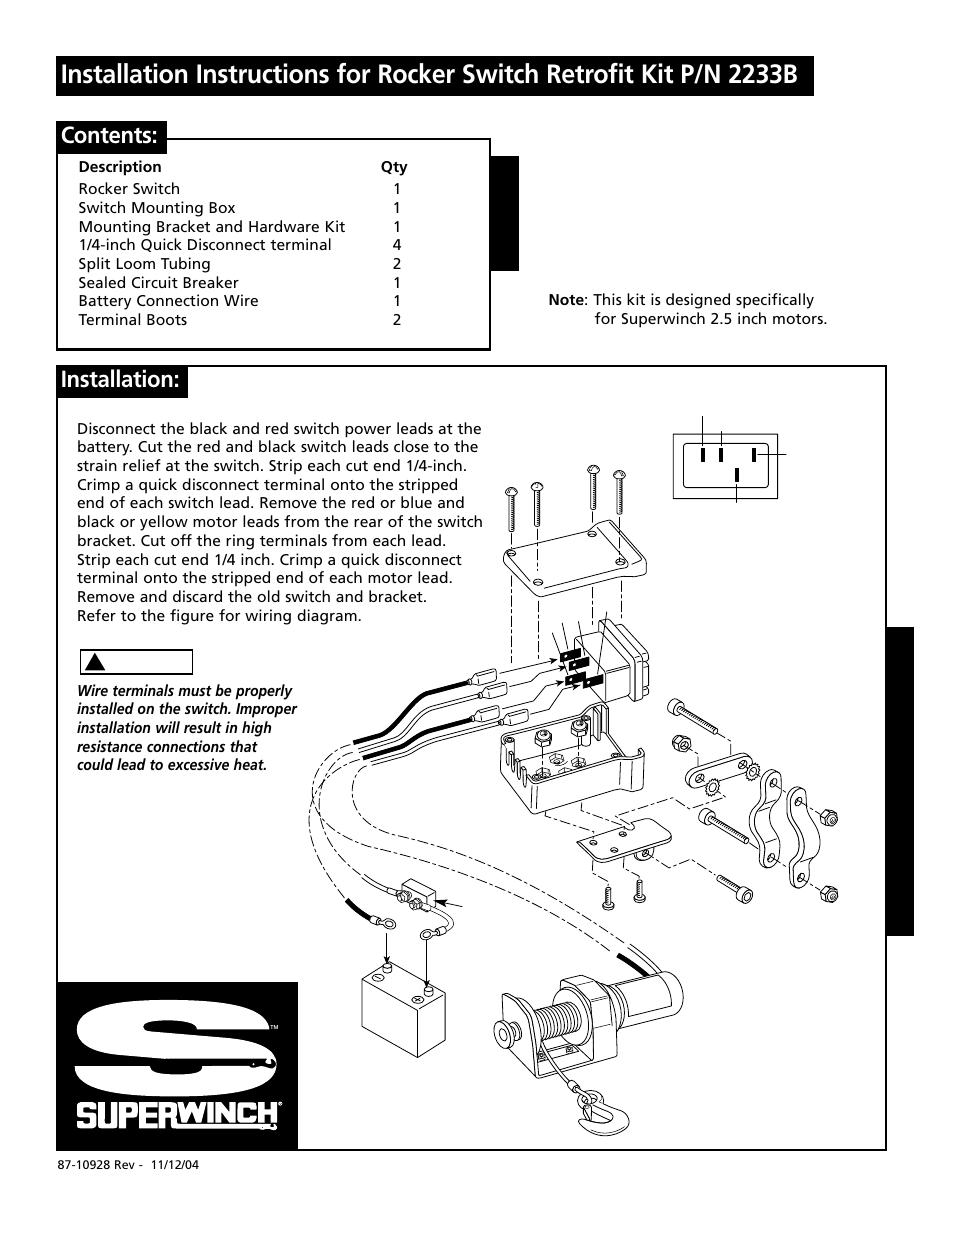 superwinch rocker switch 2233b page1?resize\=665%2C861 superwinch t1500 rocker switch wiring diagram superwinch wiring  at honlapkeszites.co